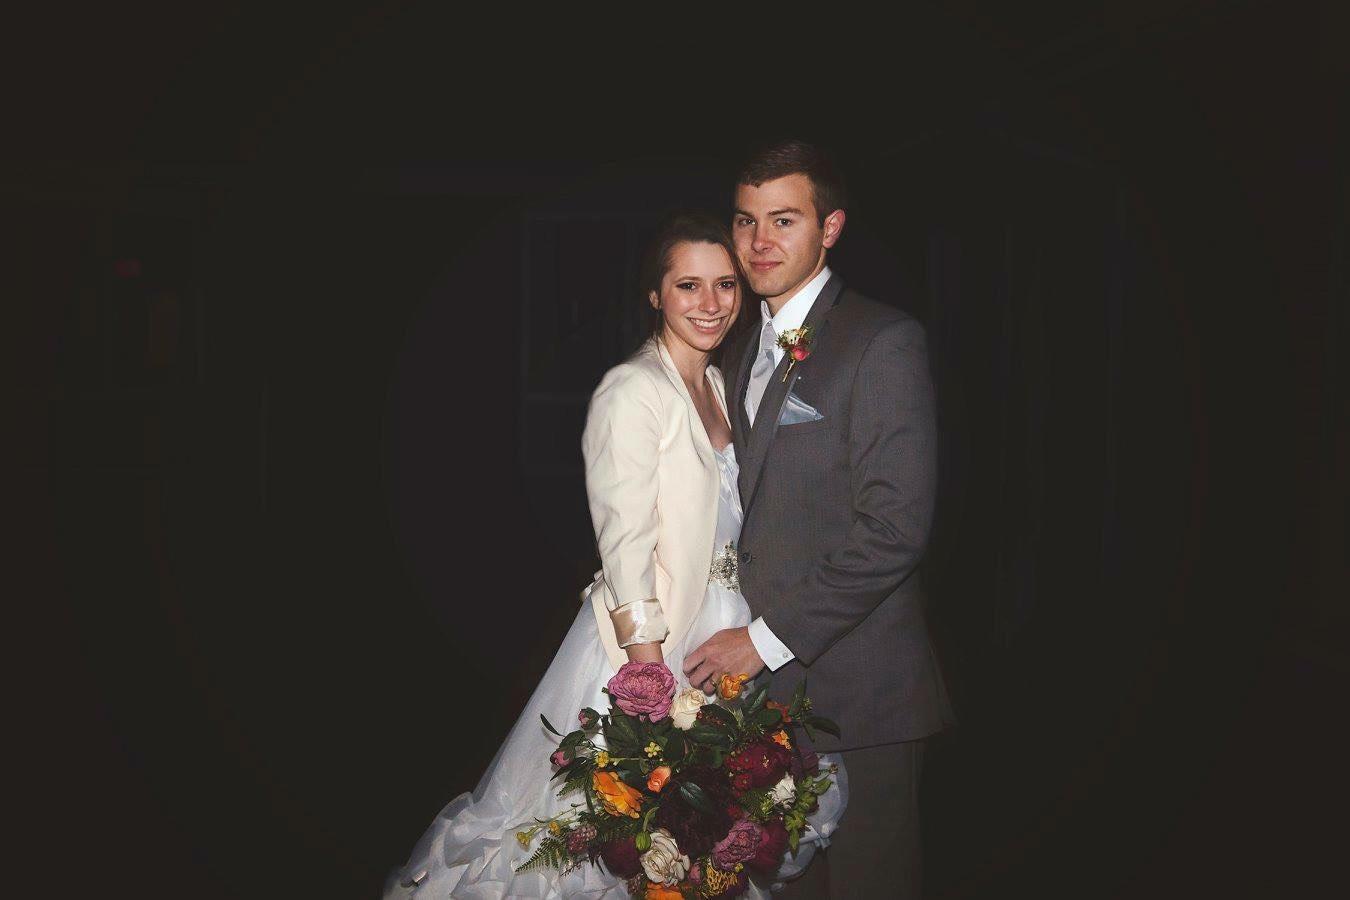 IMG_3979.JPGkatie_graham_photography_light_in_the_dark_photography_winter_wedding_stress_free_wedding_planning